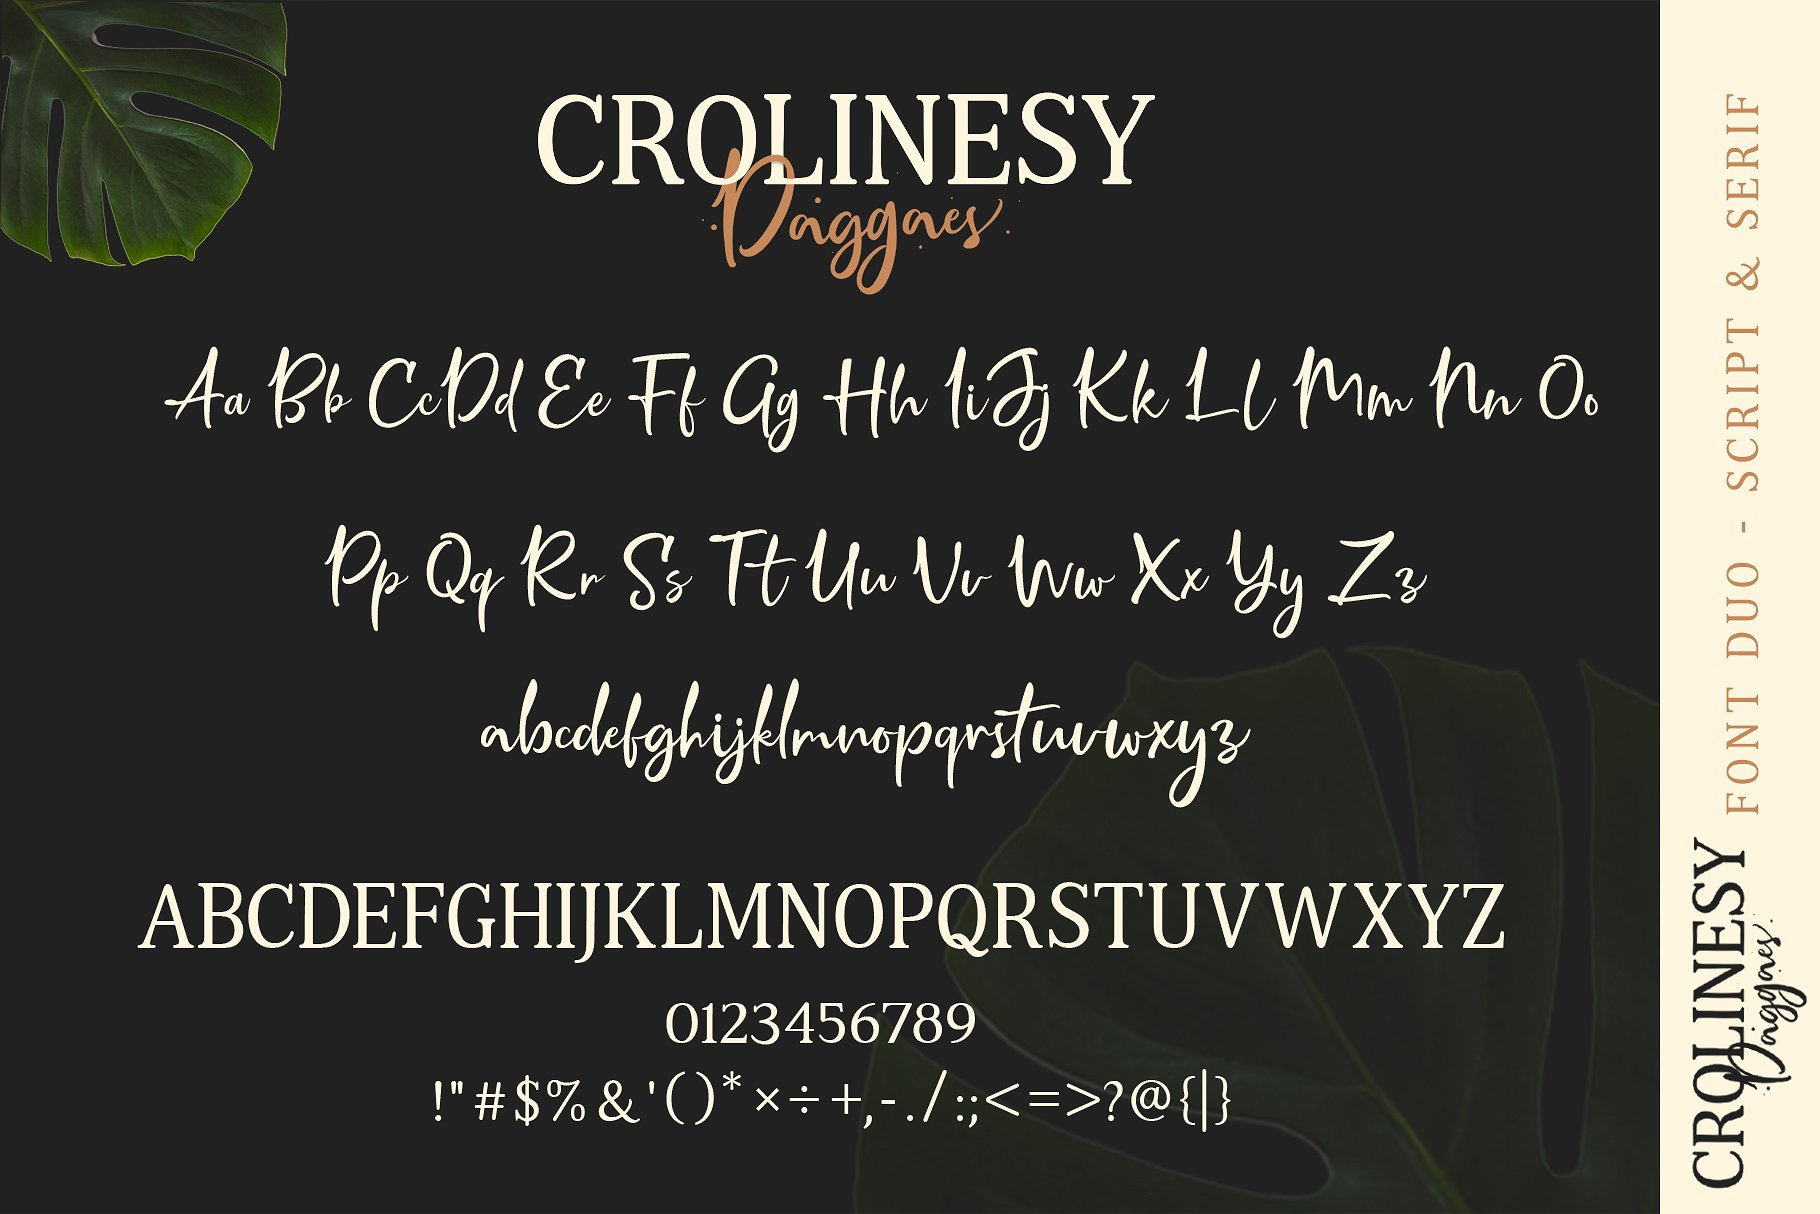 Crolinesy Daggaes Font Duo 6 - دانلود فونت Crolinesy Daggaes - مجموعه 6 فونت و فونت اسکریپت پرمیوم